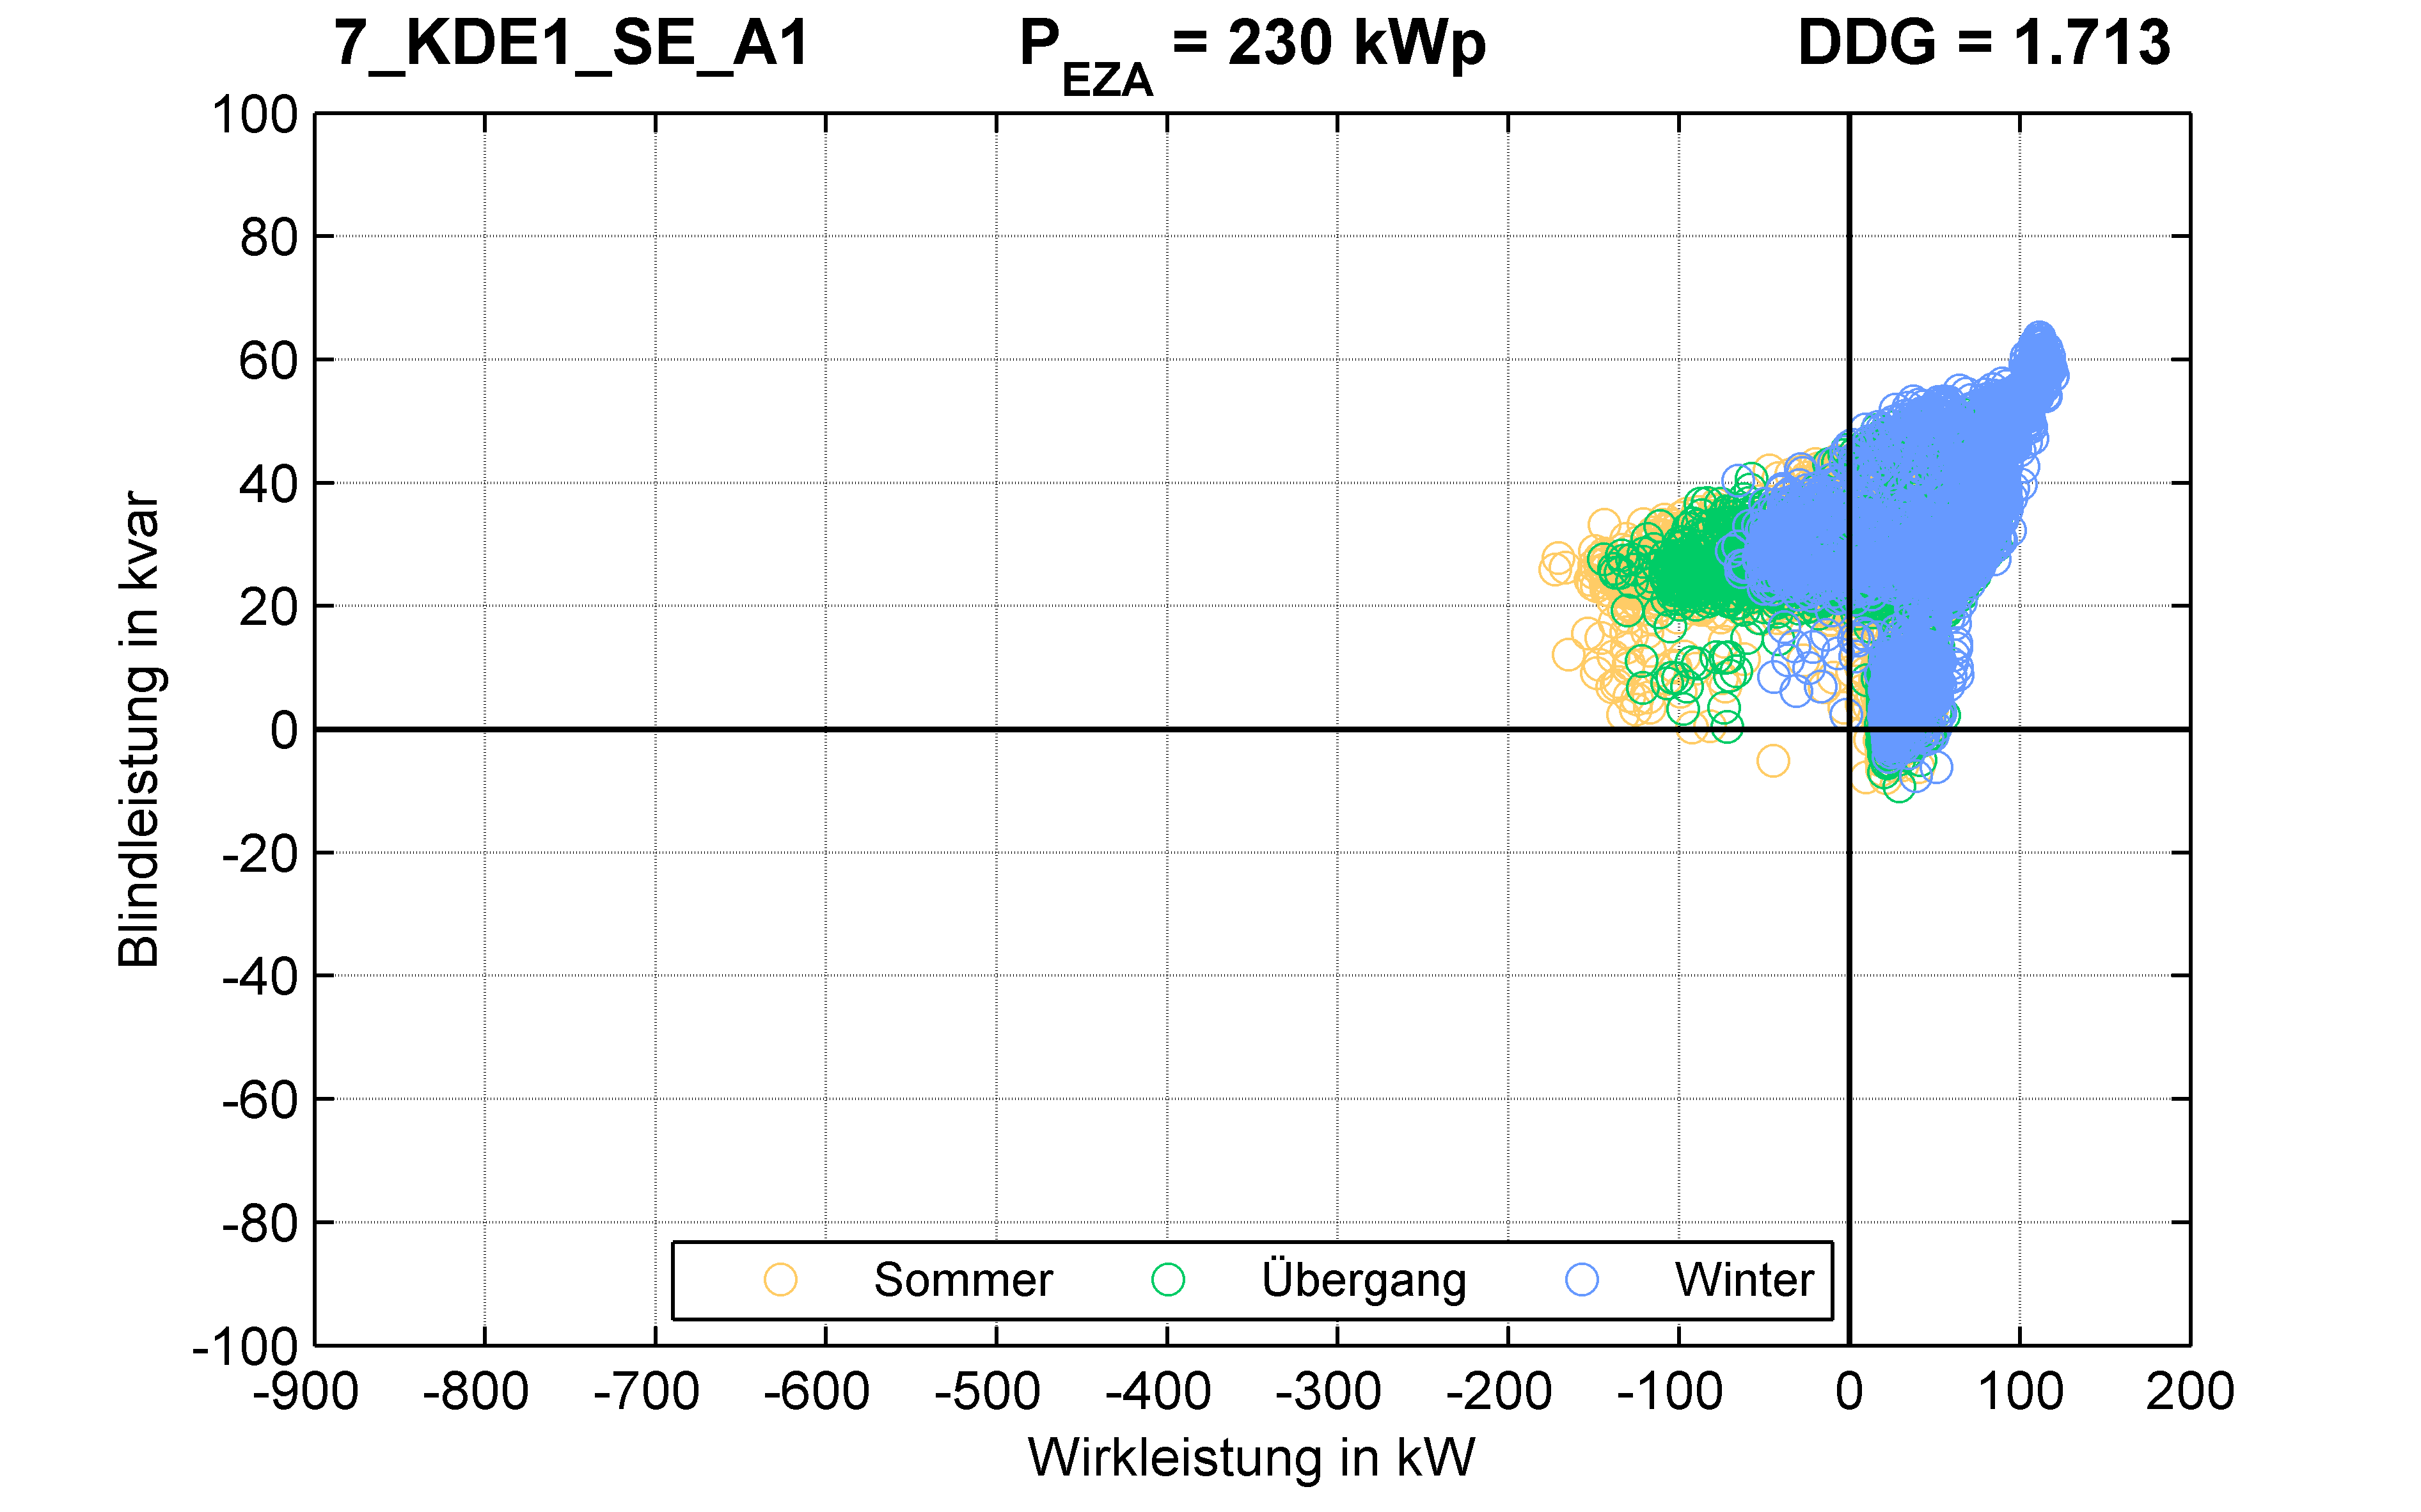 KDE1 | Längsregler (SE) A1 | PQ-Verhalten